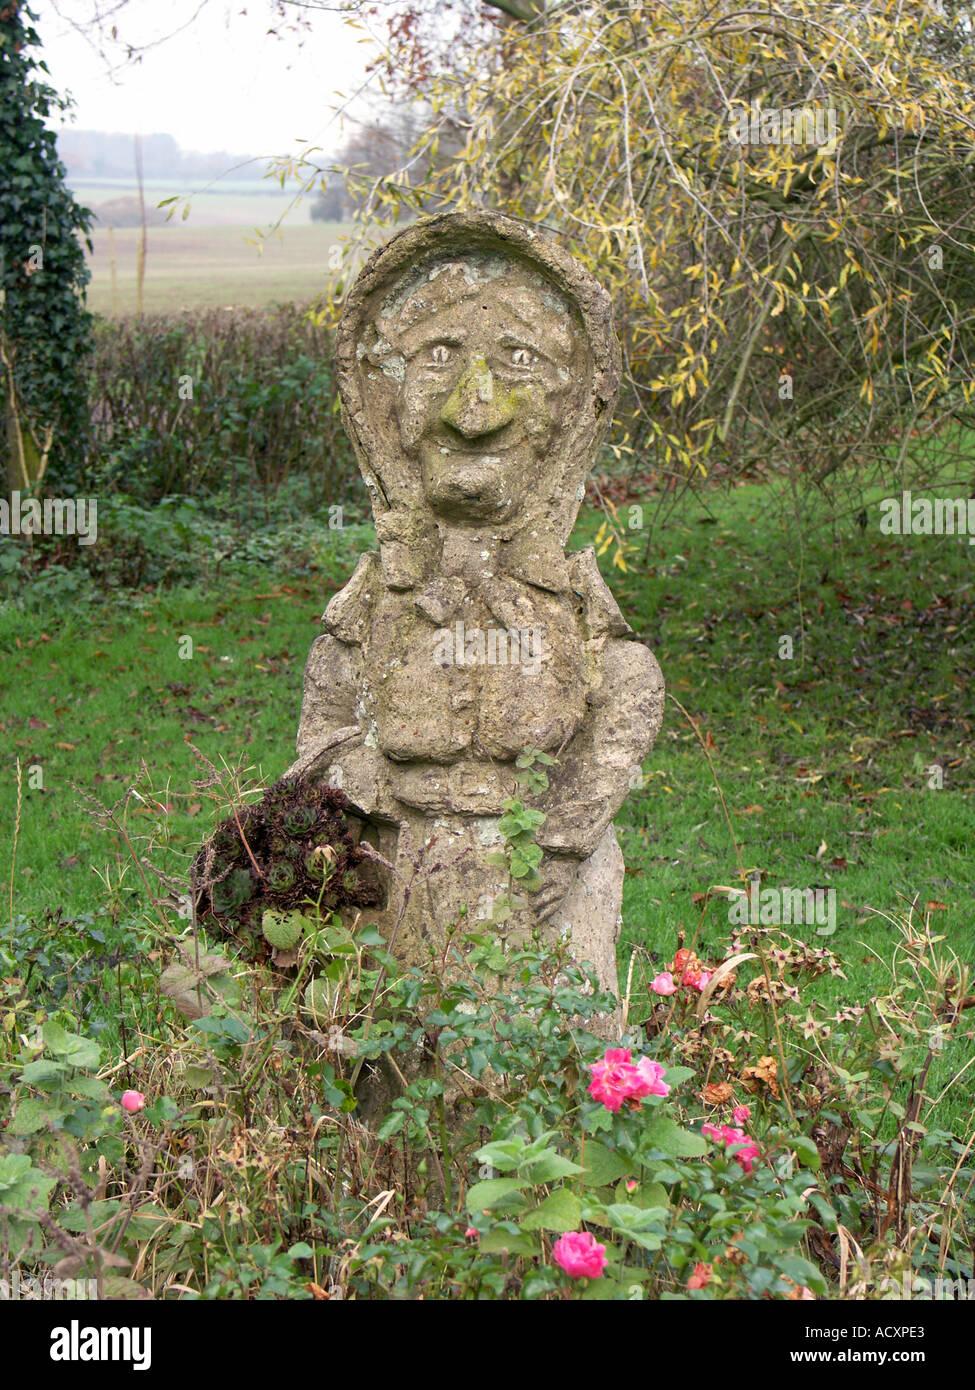 An Ornamental Humourous Concrete Garden Statue Or Figure